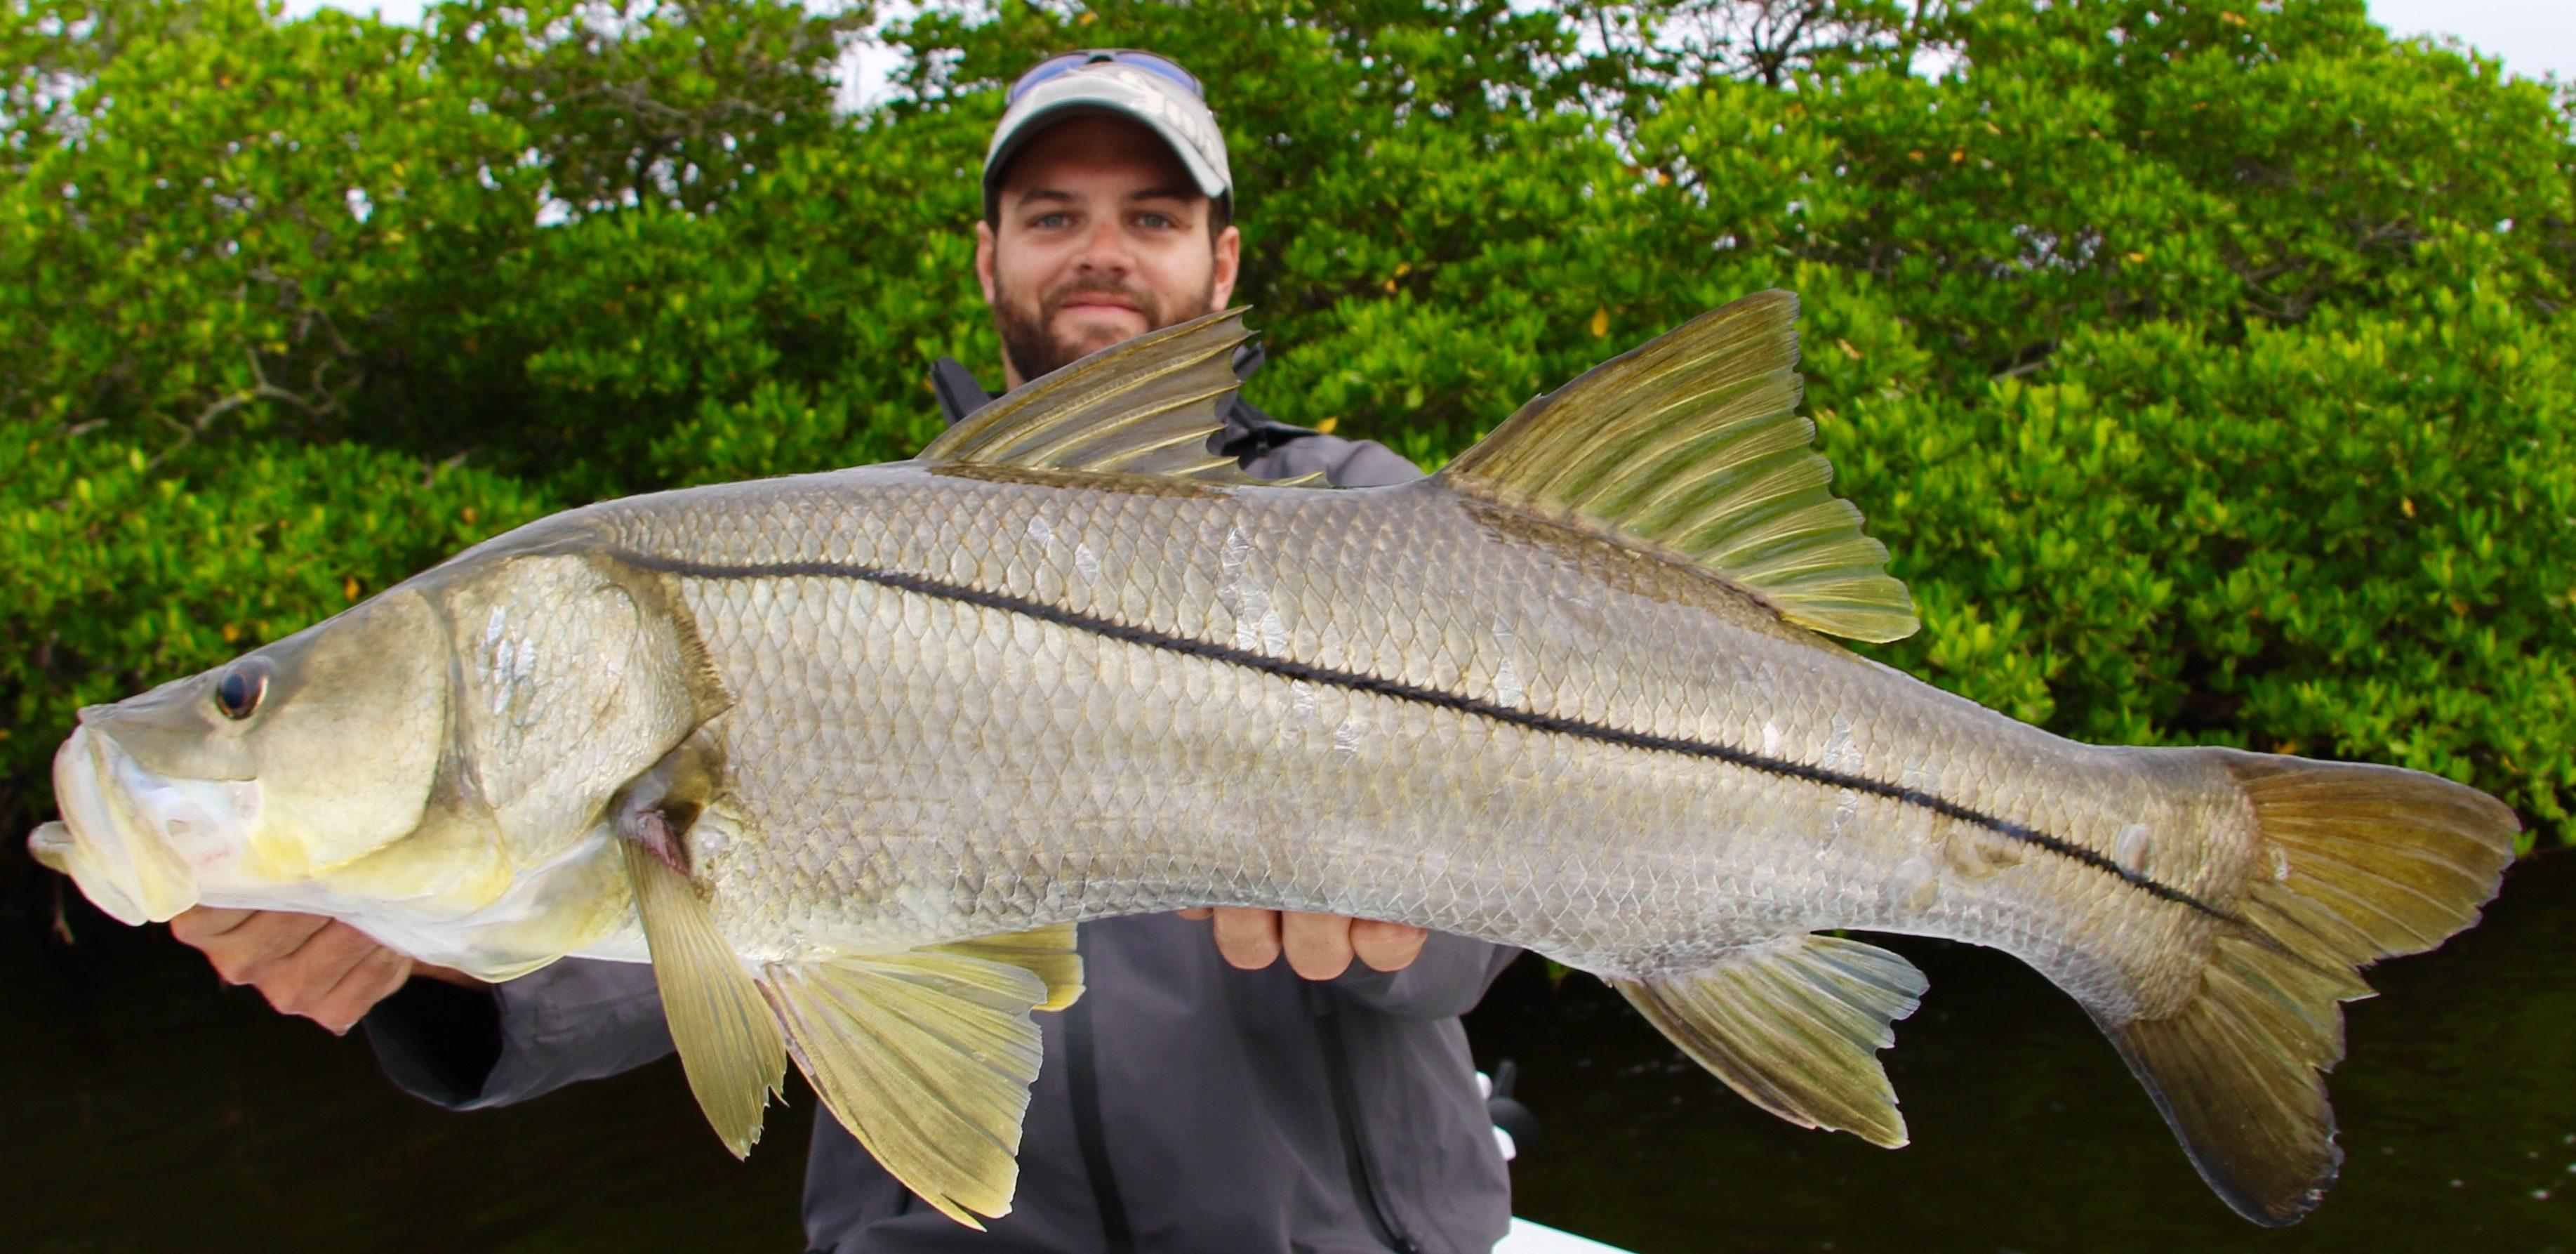 No boats, Big Fish - Everglades Fishing Guide